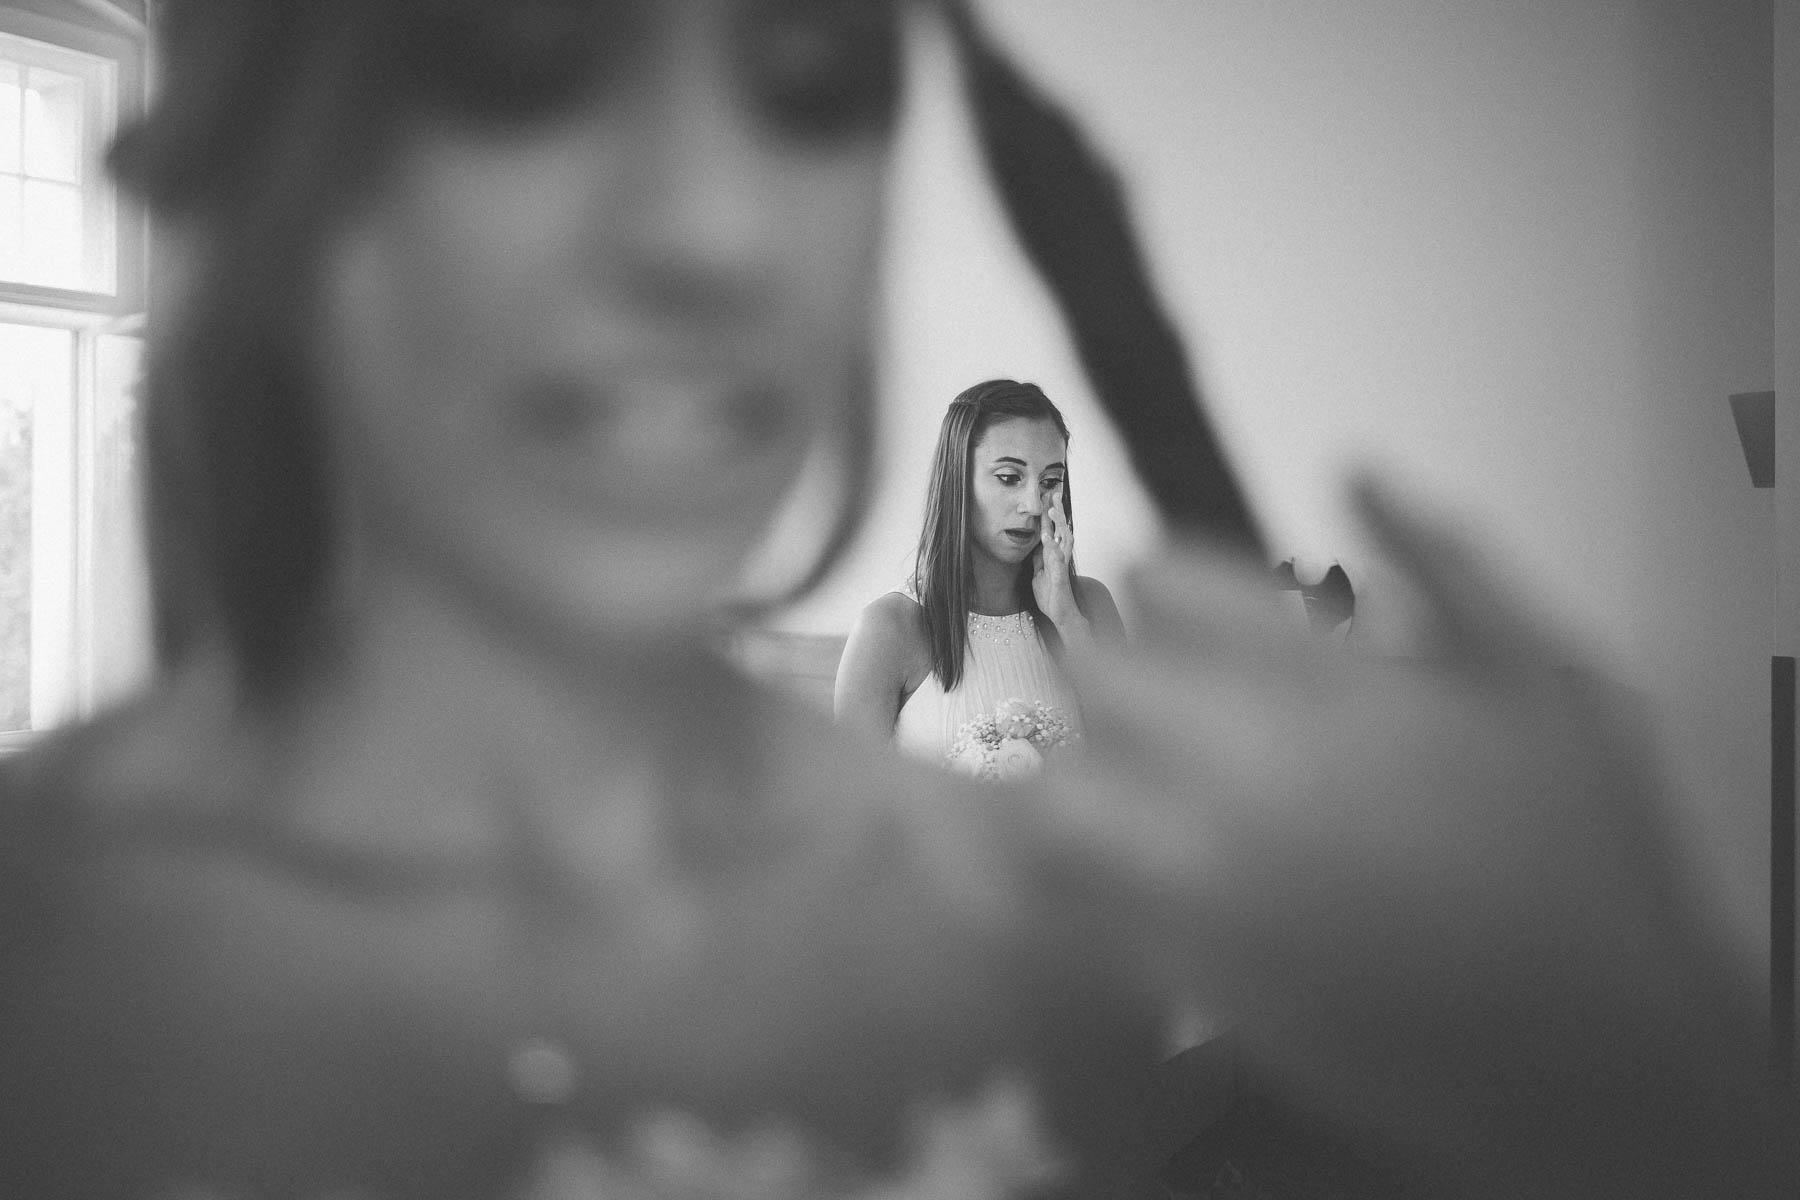 www.glamoureffekt.de - 20160820140141 - 6100- hz-gini-fabi.jpg